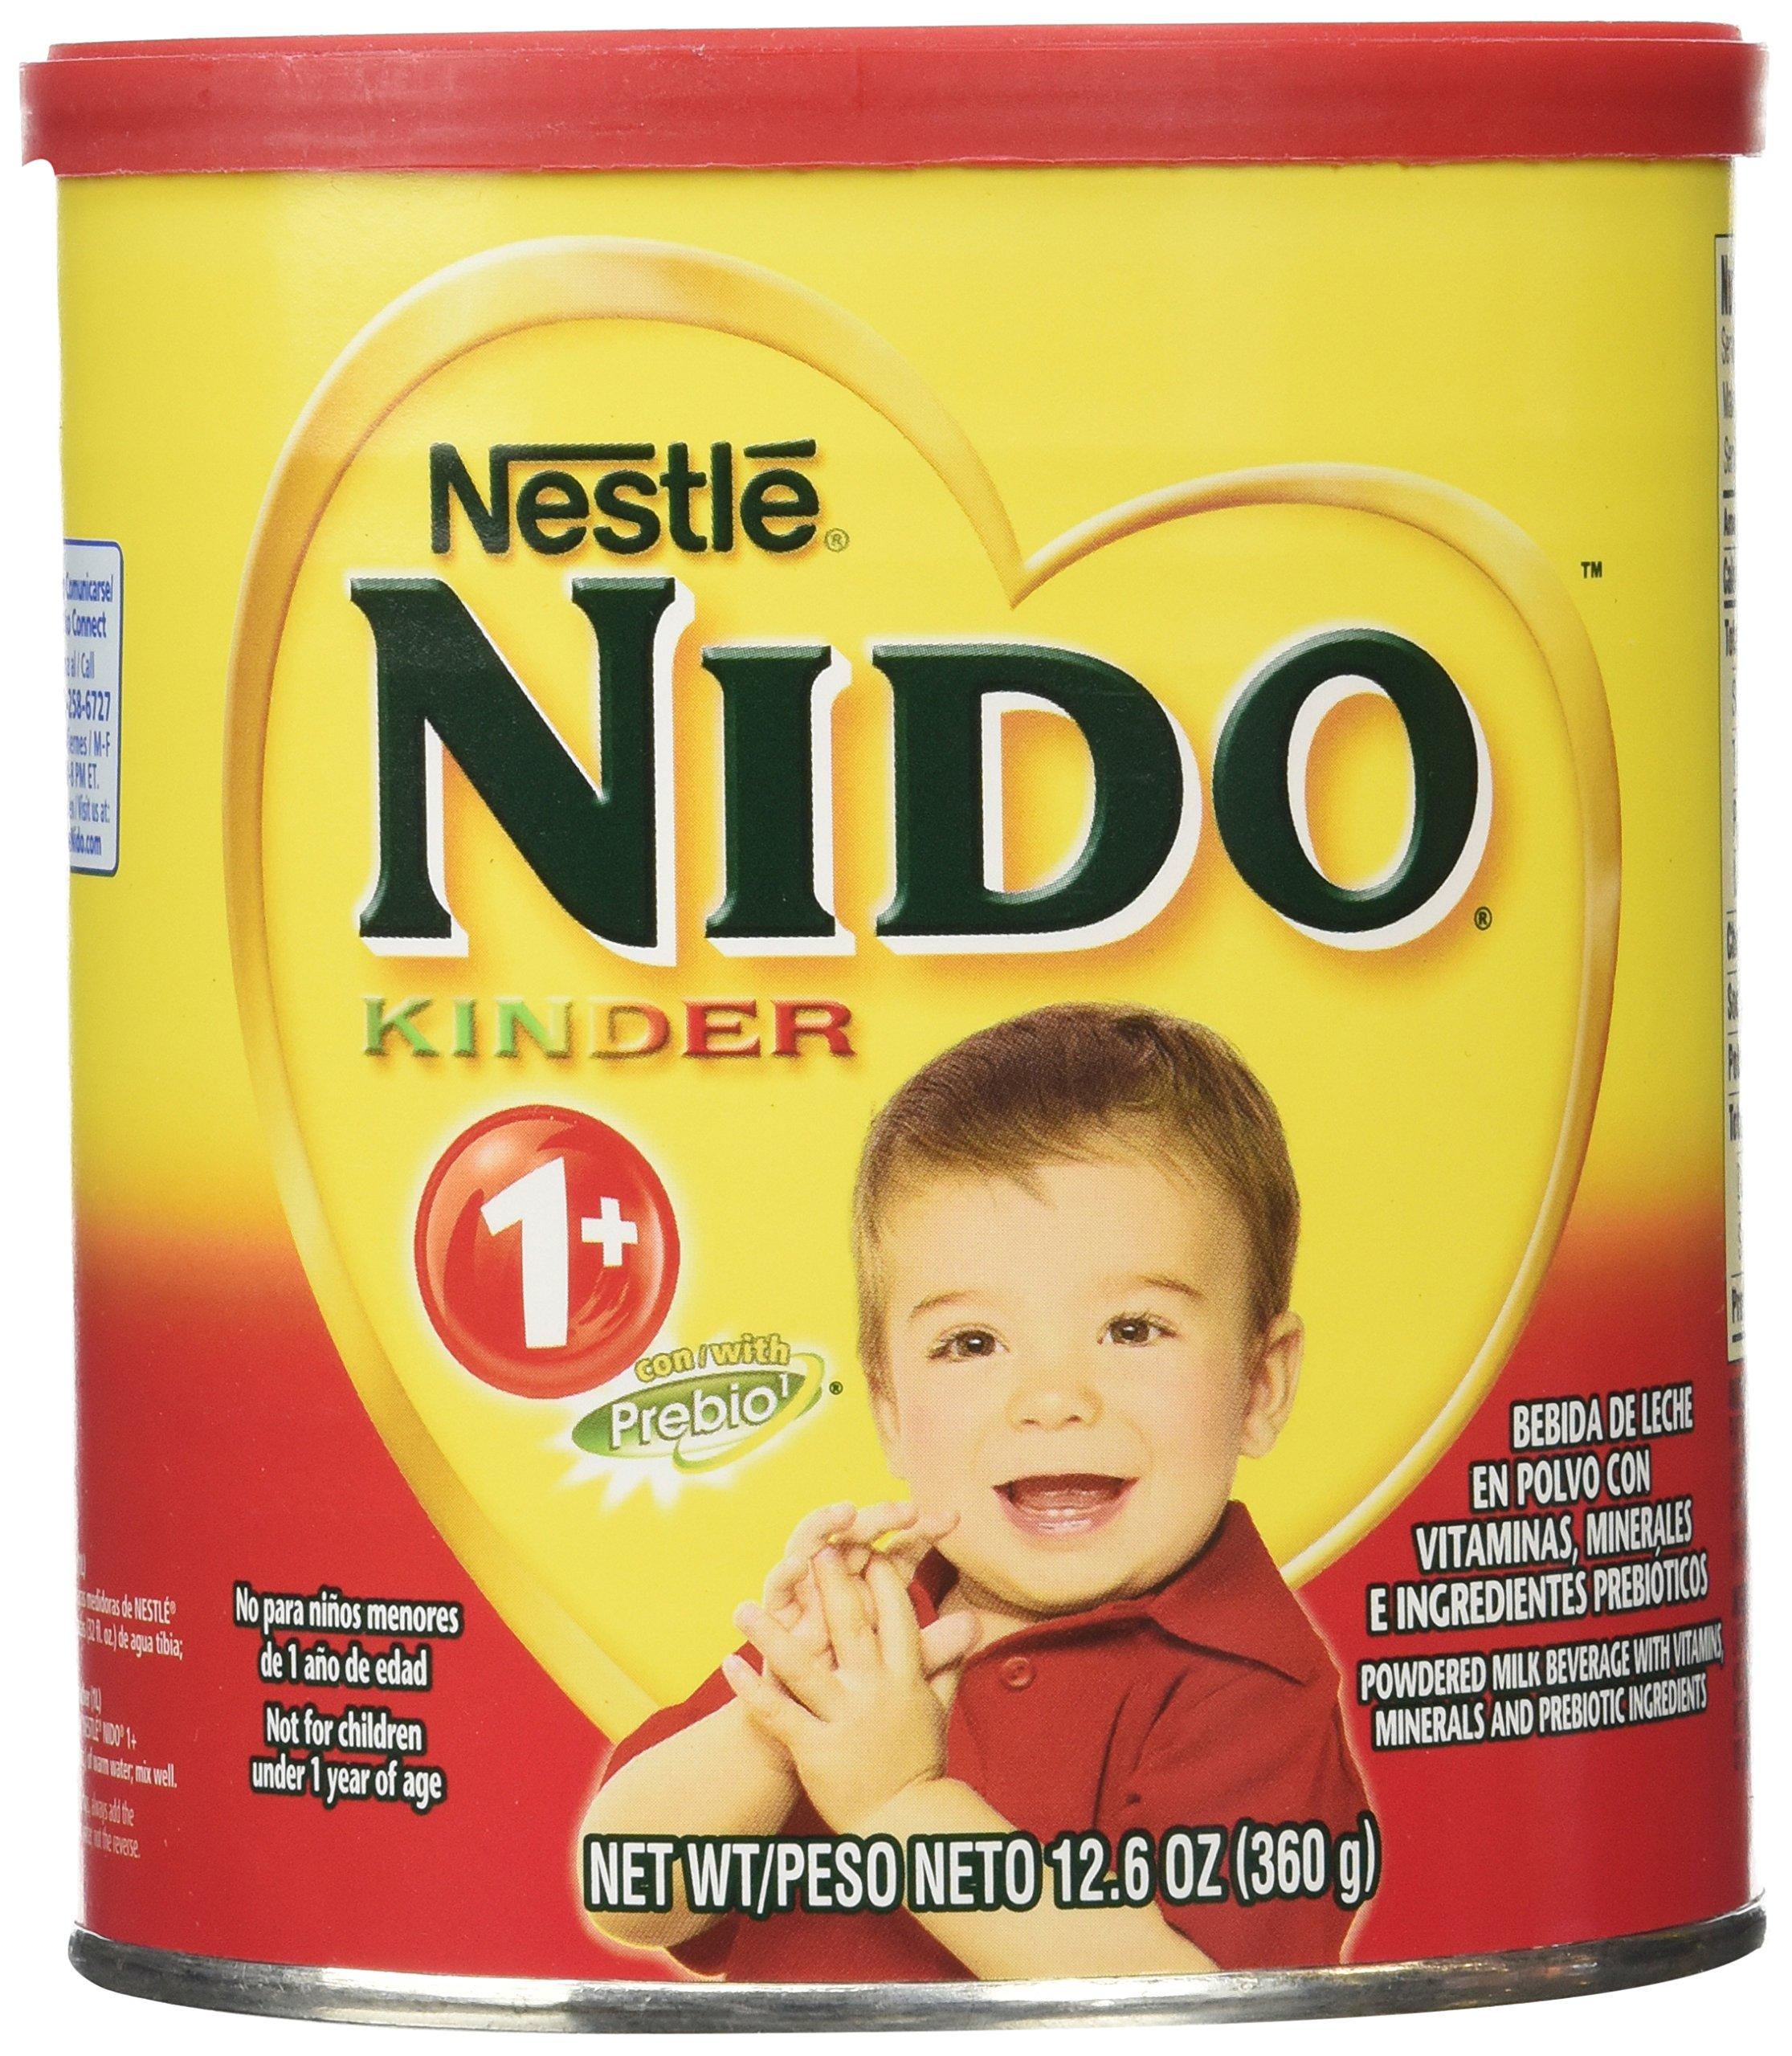 Amazon.com : Nido Kinder Milk by Nestle 360 g : Powdered Milk : Grocery & Gourmet Food